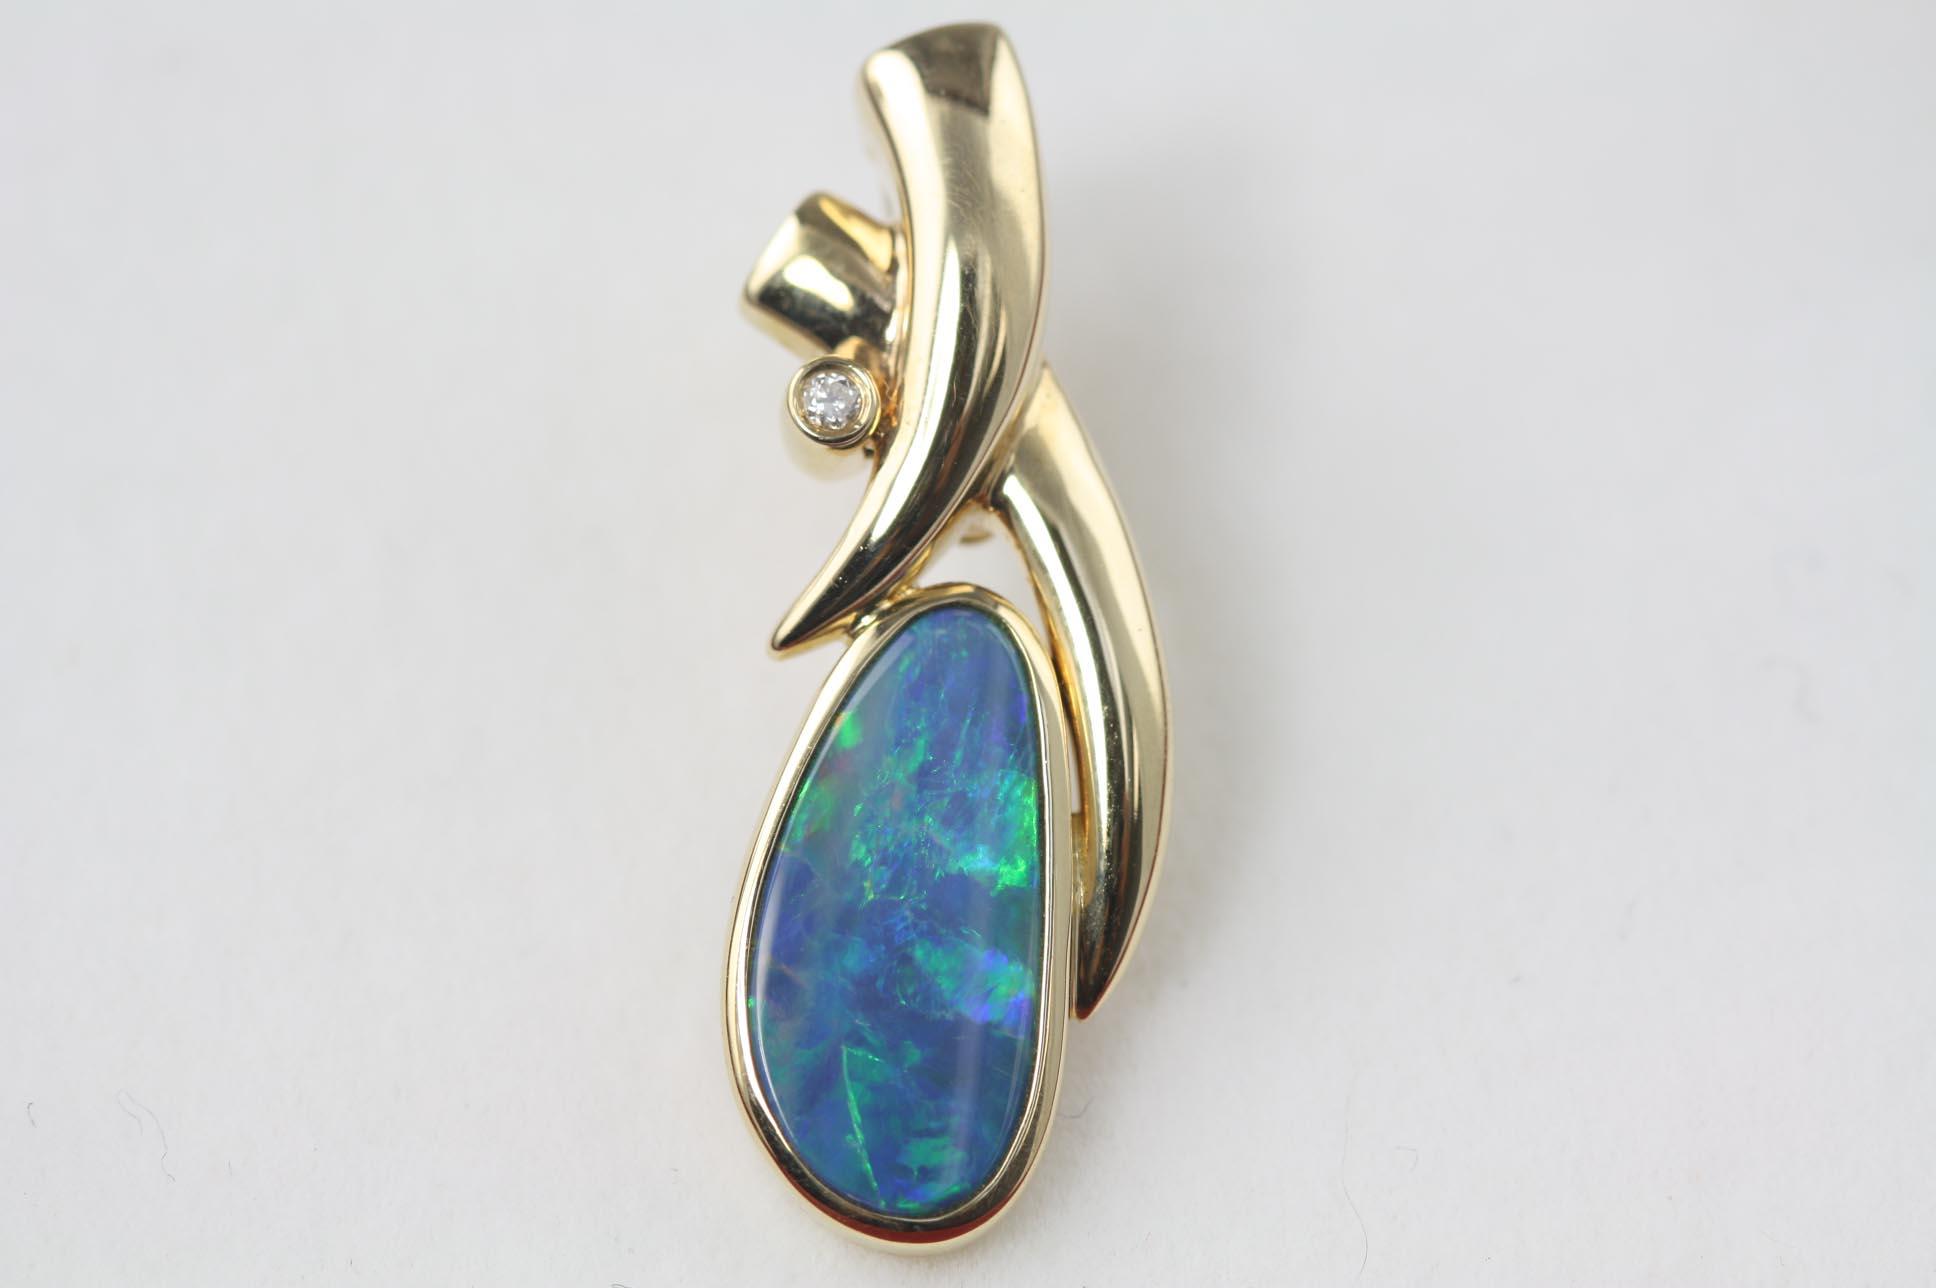 Opal Pendant And Enhancer